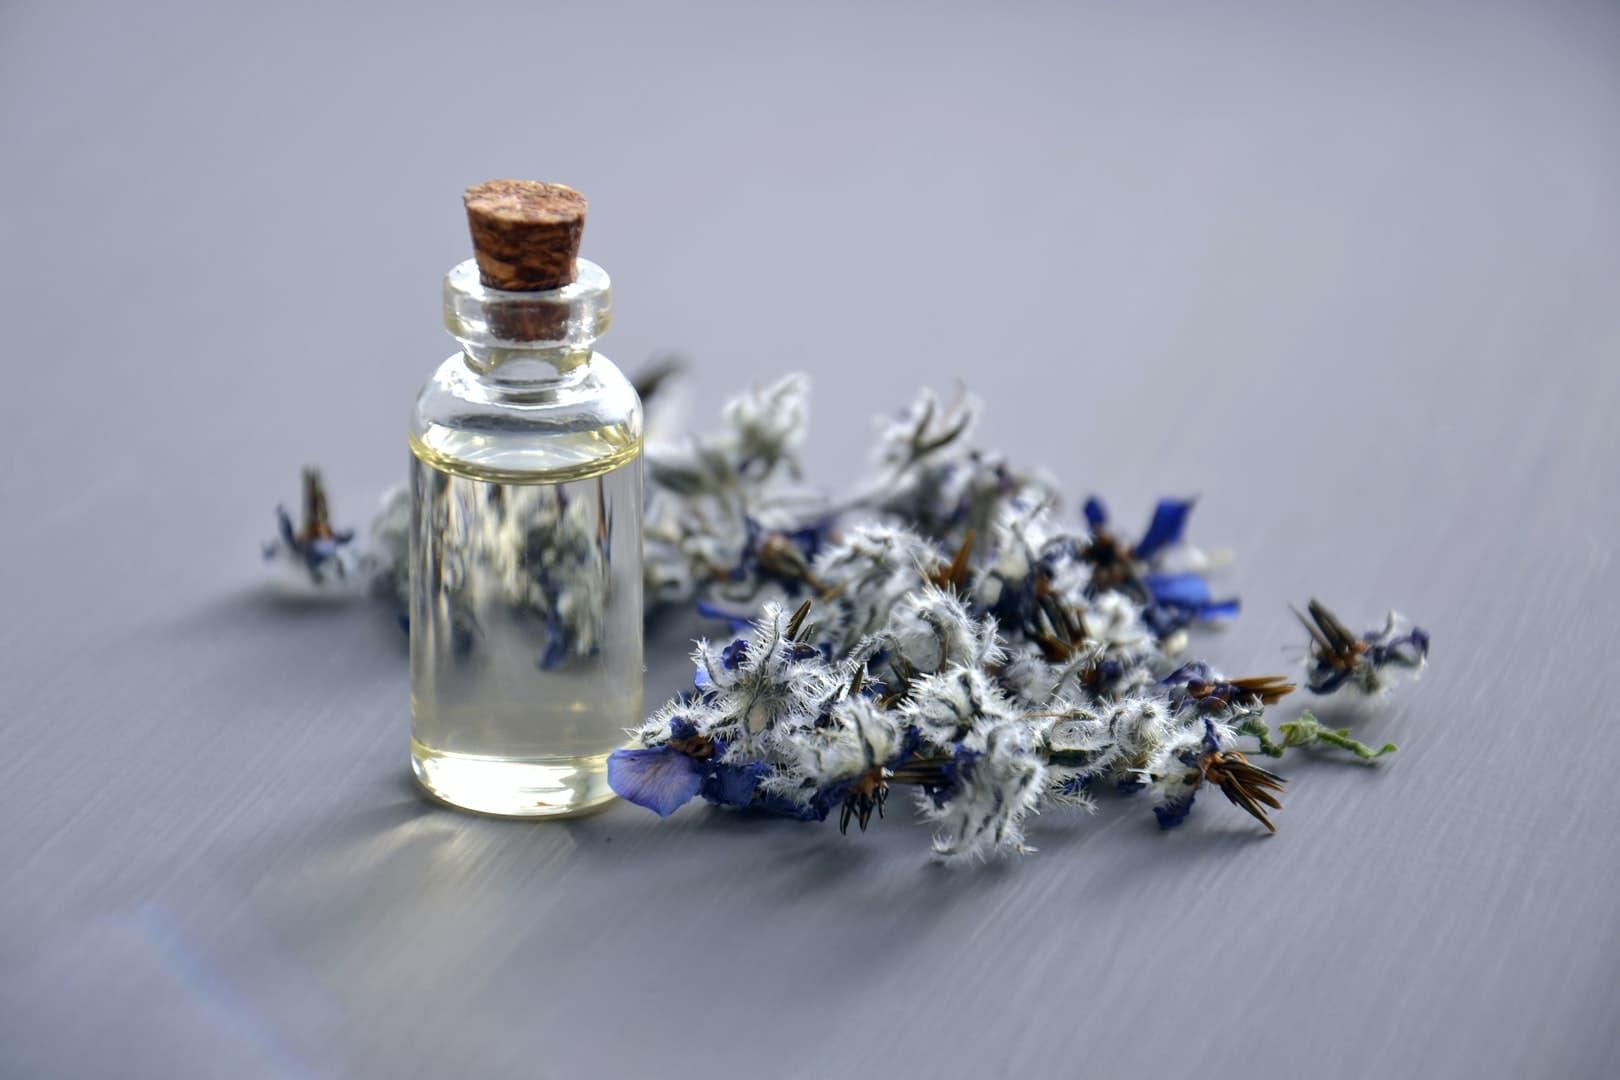 Naturopathie : bienfaits, contre-indications et quand consulter ?